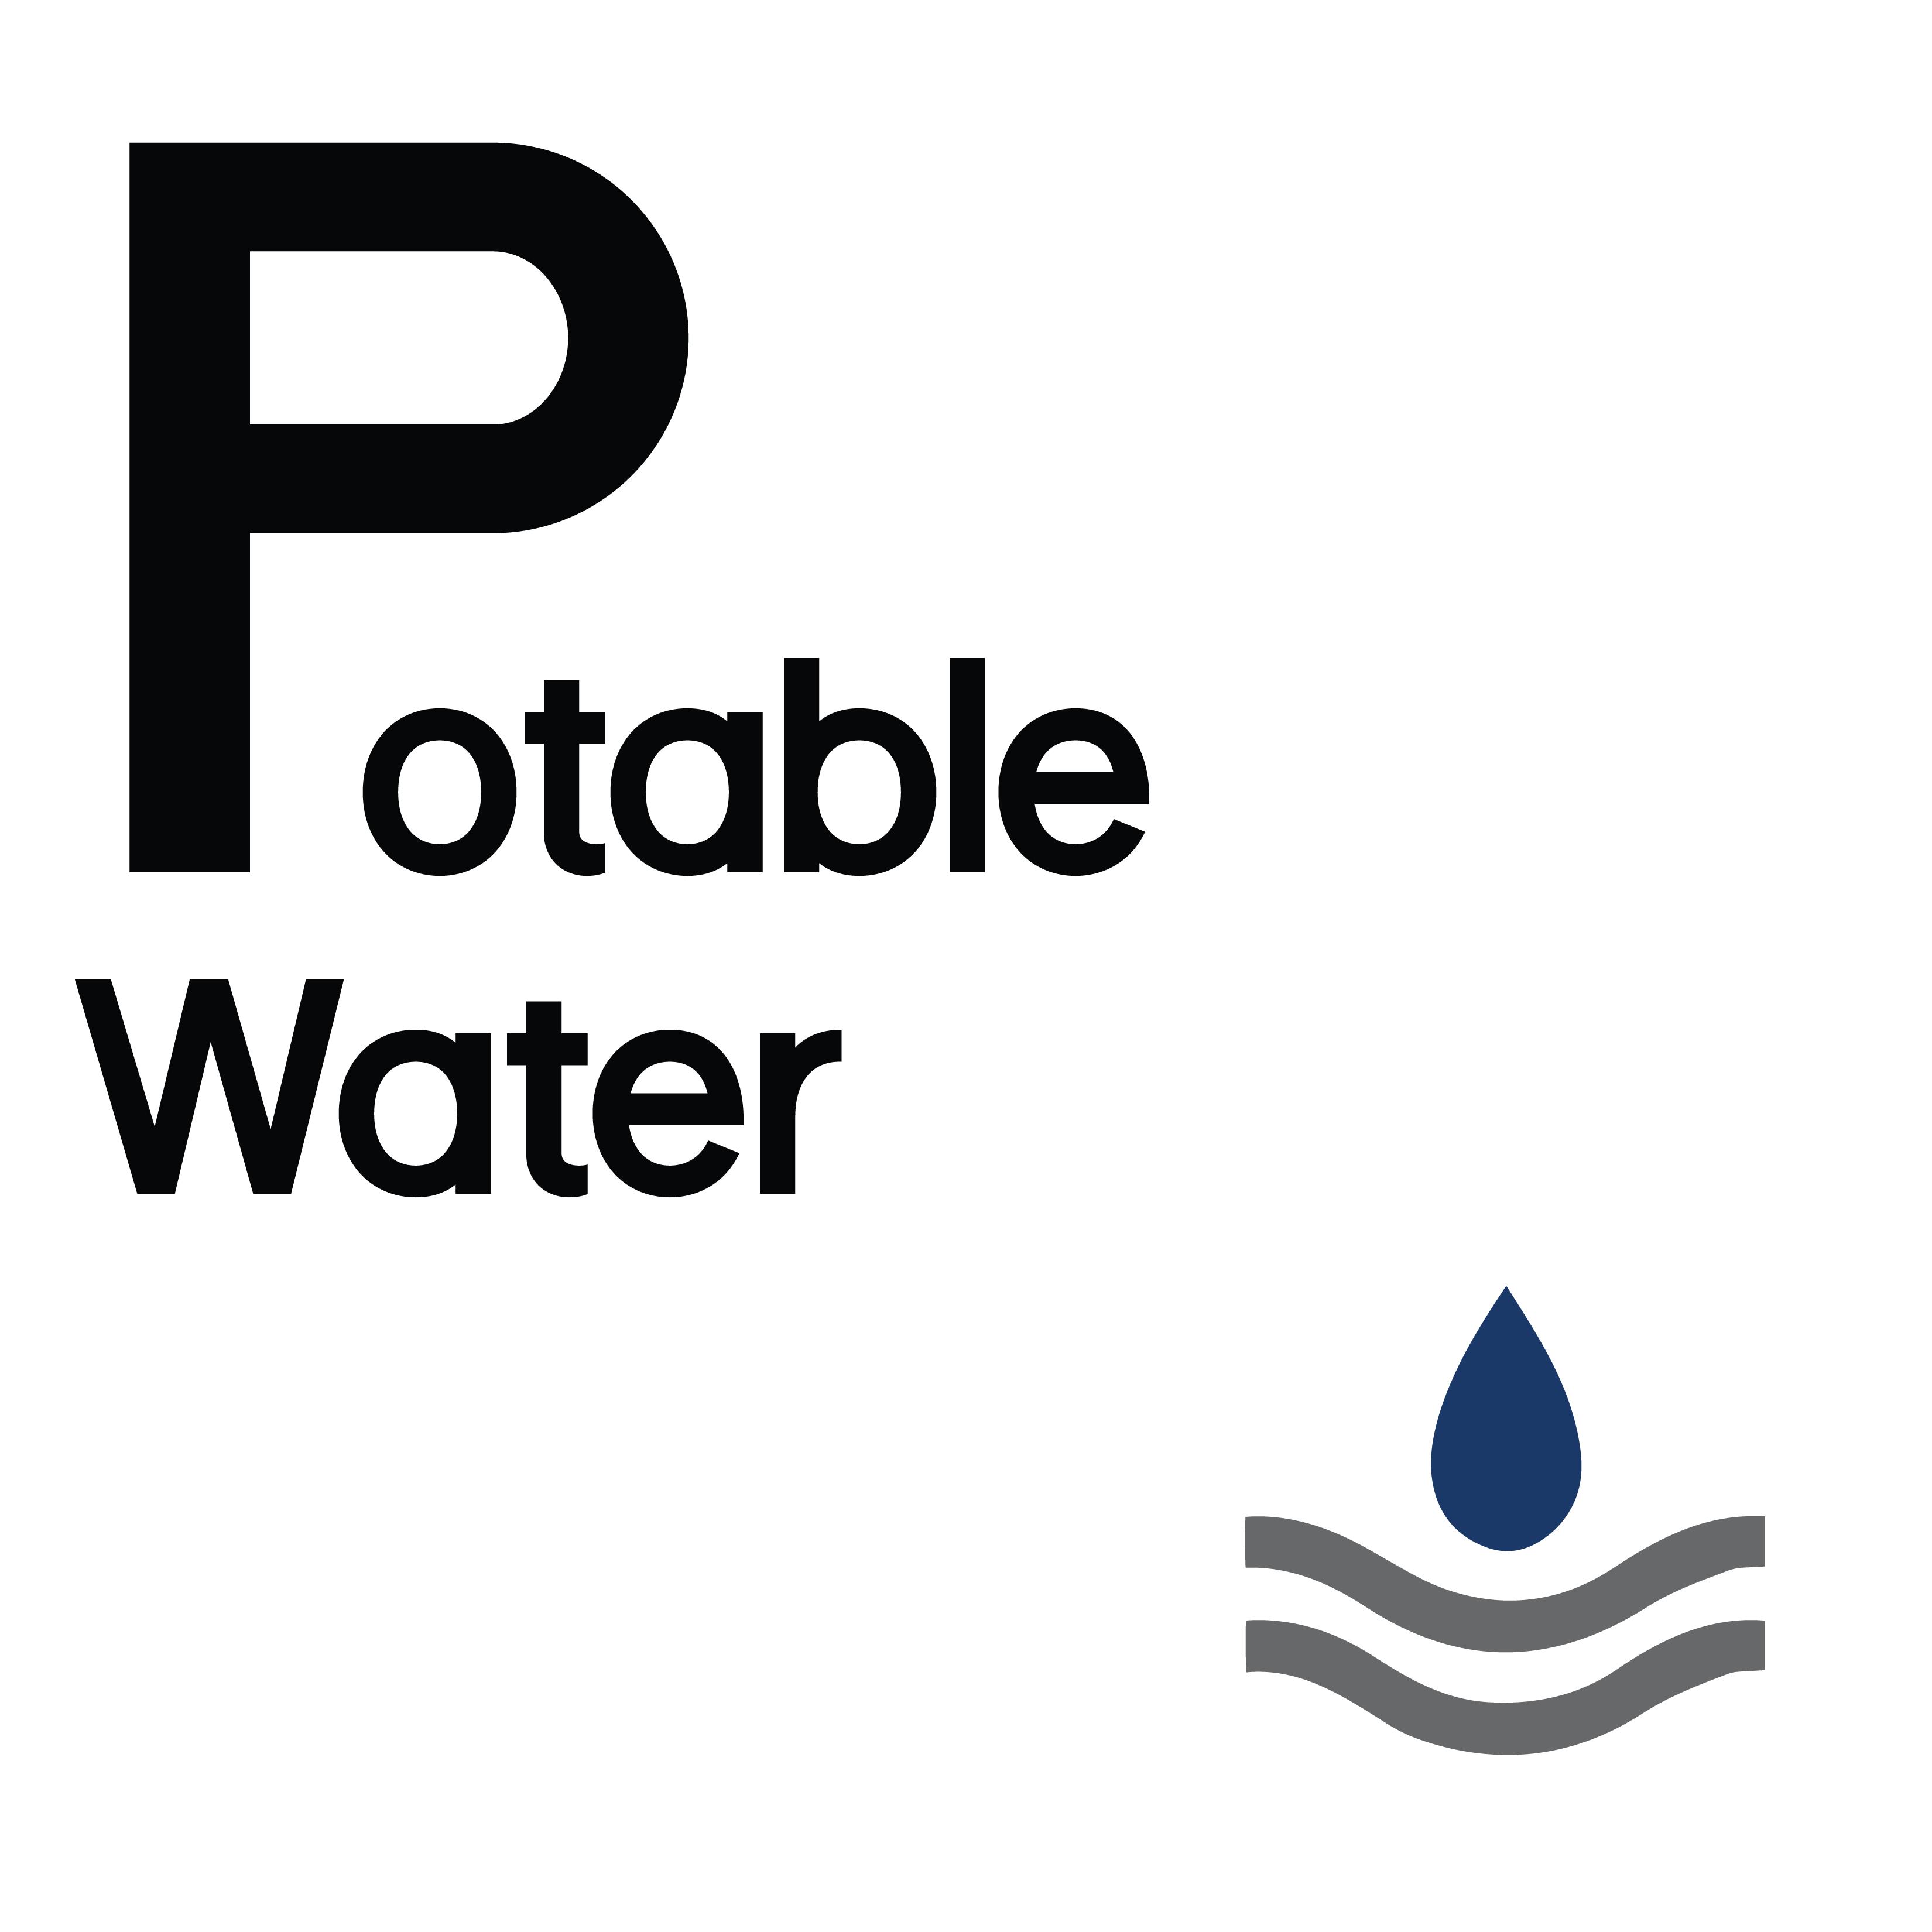 Potable Water-01